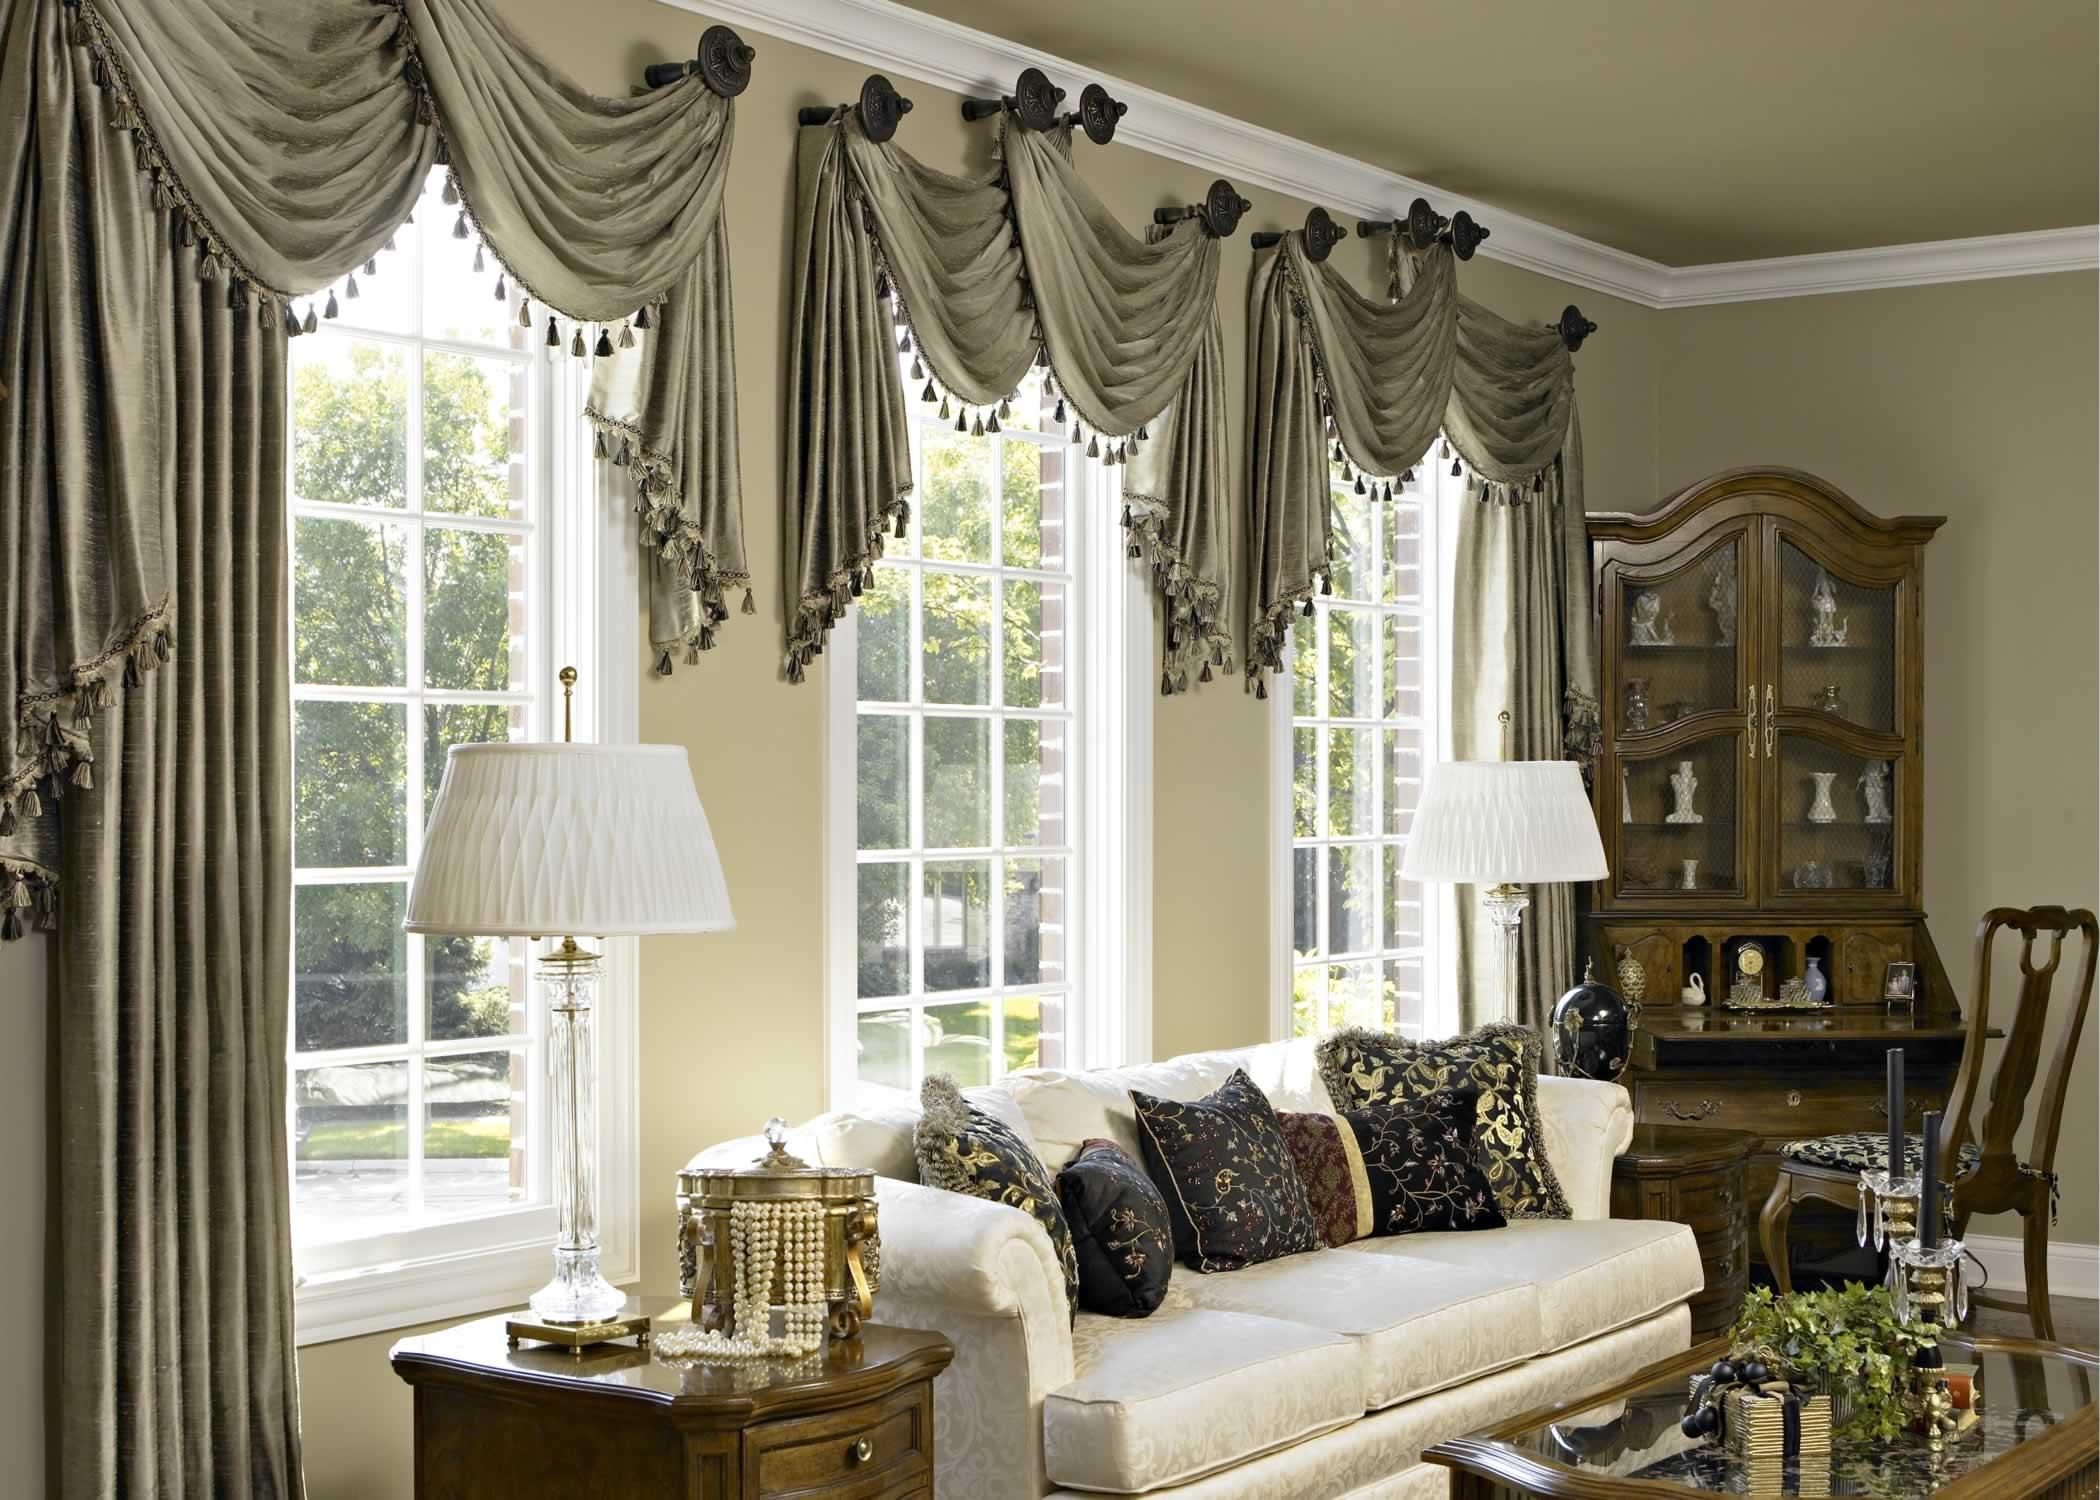 Elegant Cool Window Valance Ideas For Room Interior Decorating Design In Curtain Valance window valance ideas living room